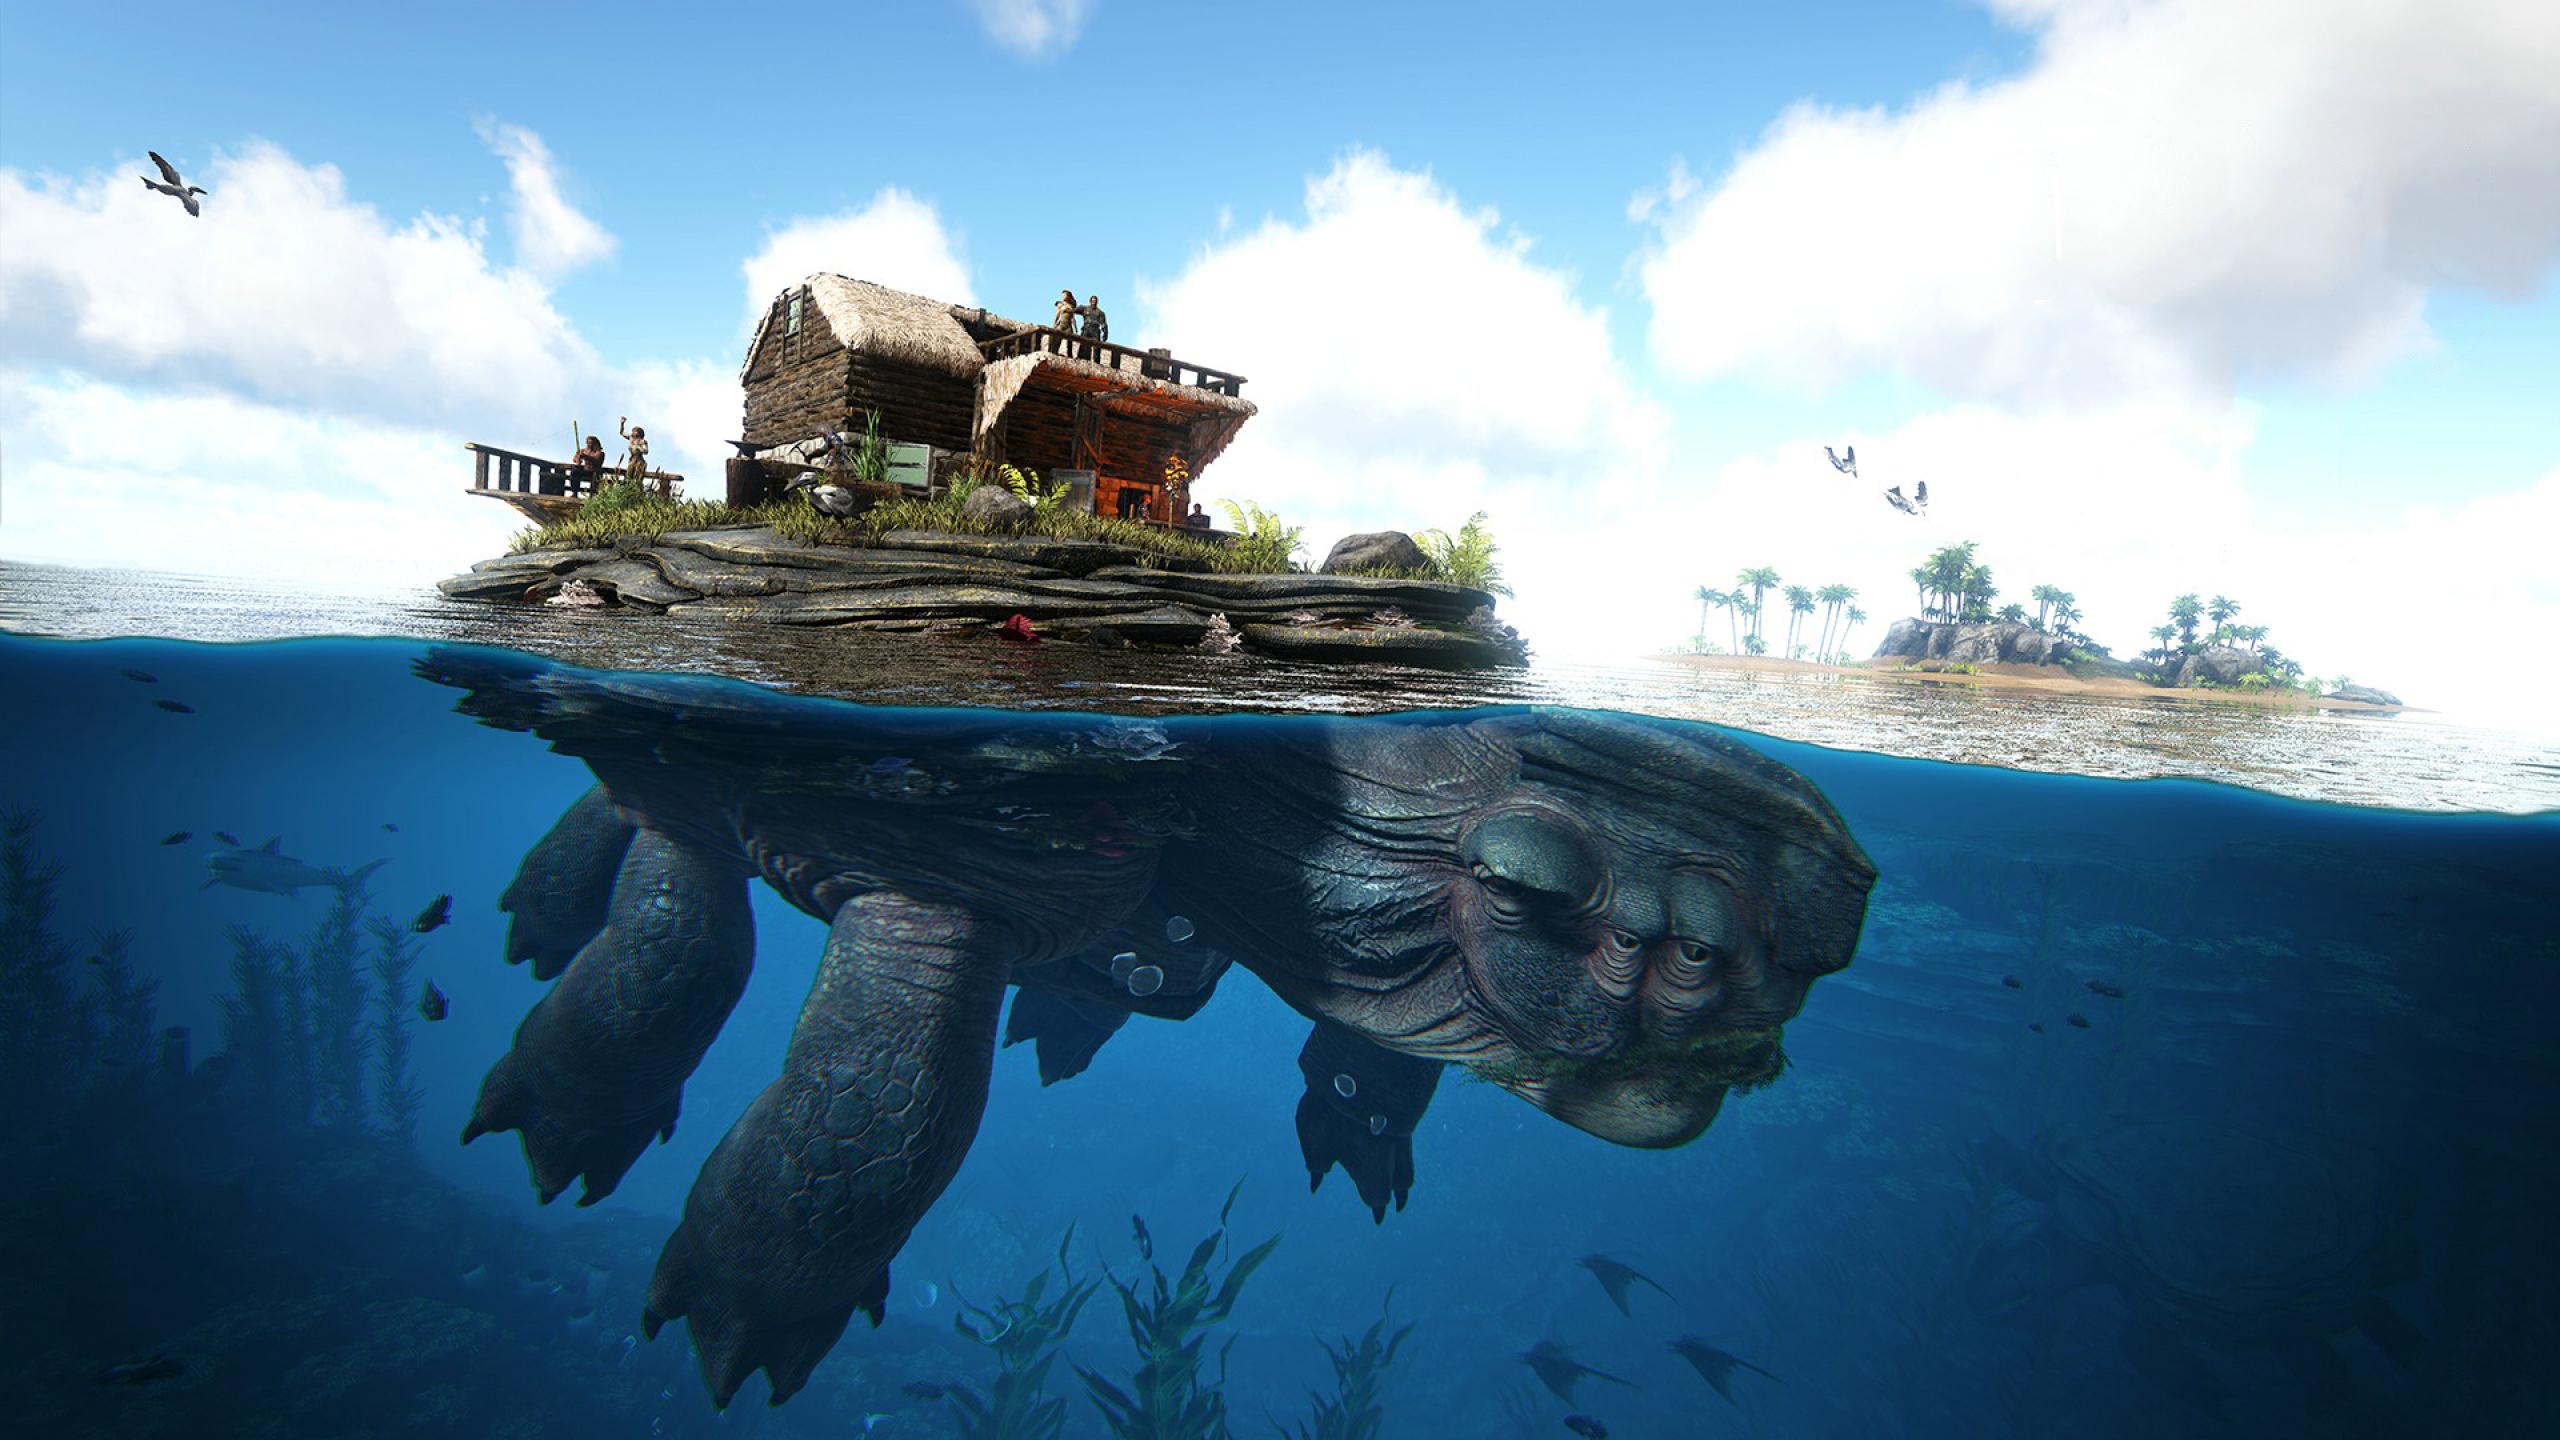 2560x1440 Ark Survival Evolved 1440p Resolution Wallpaper